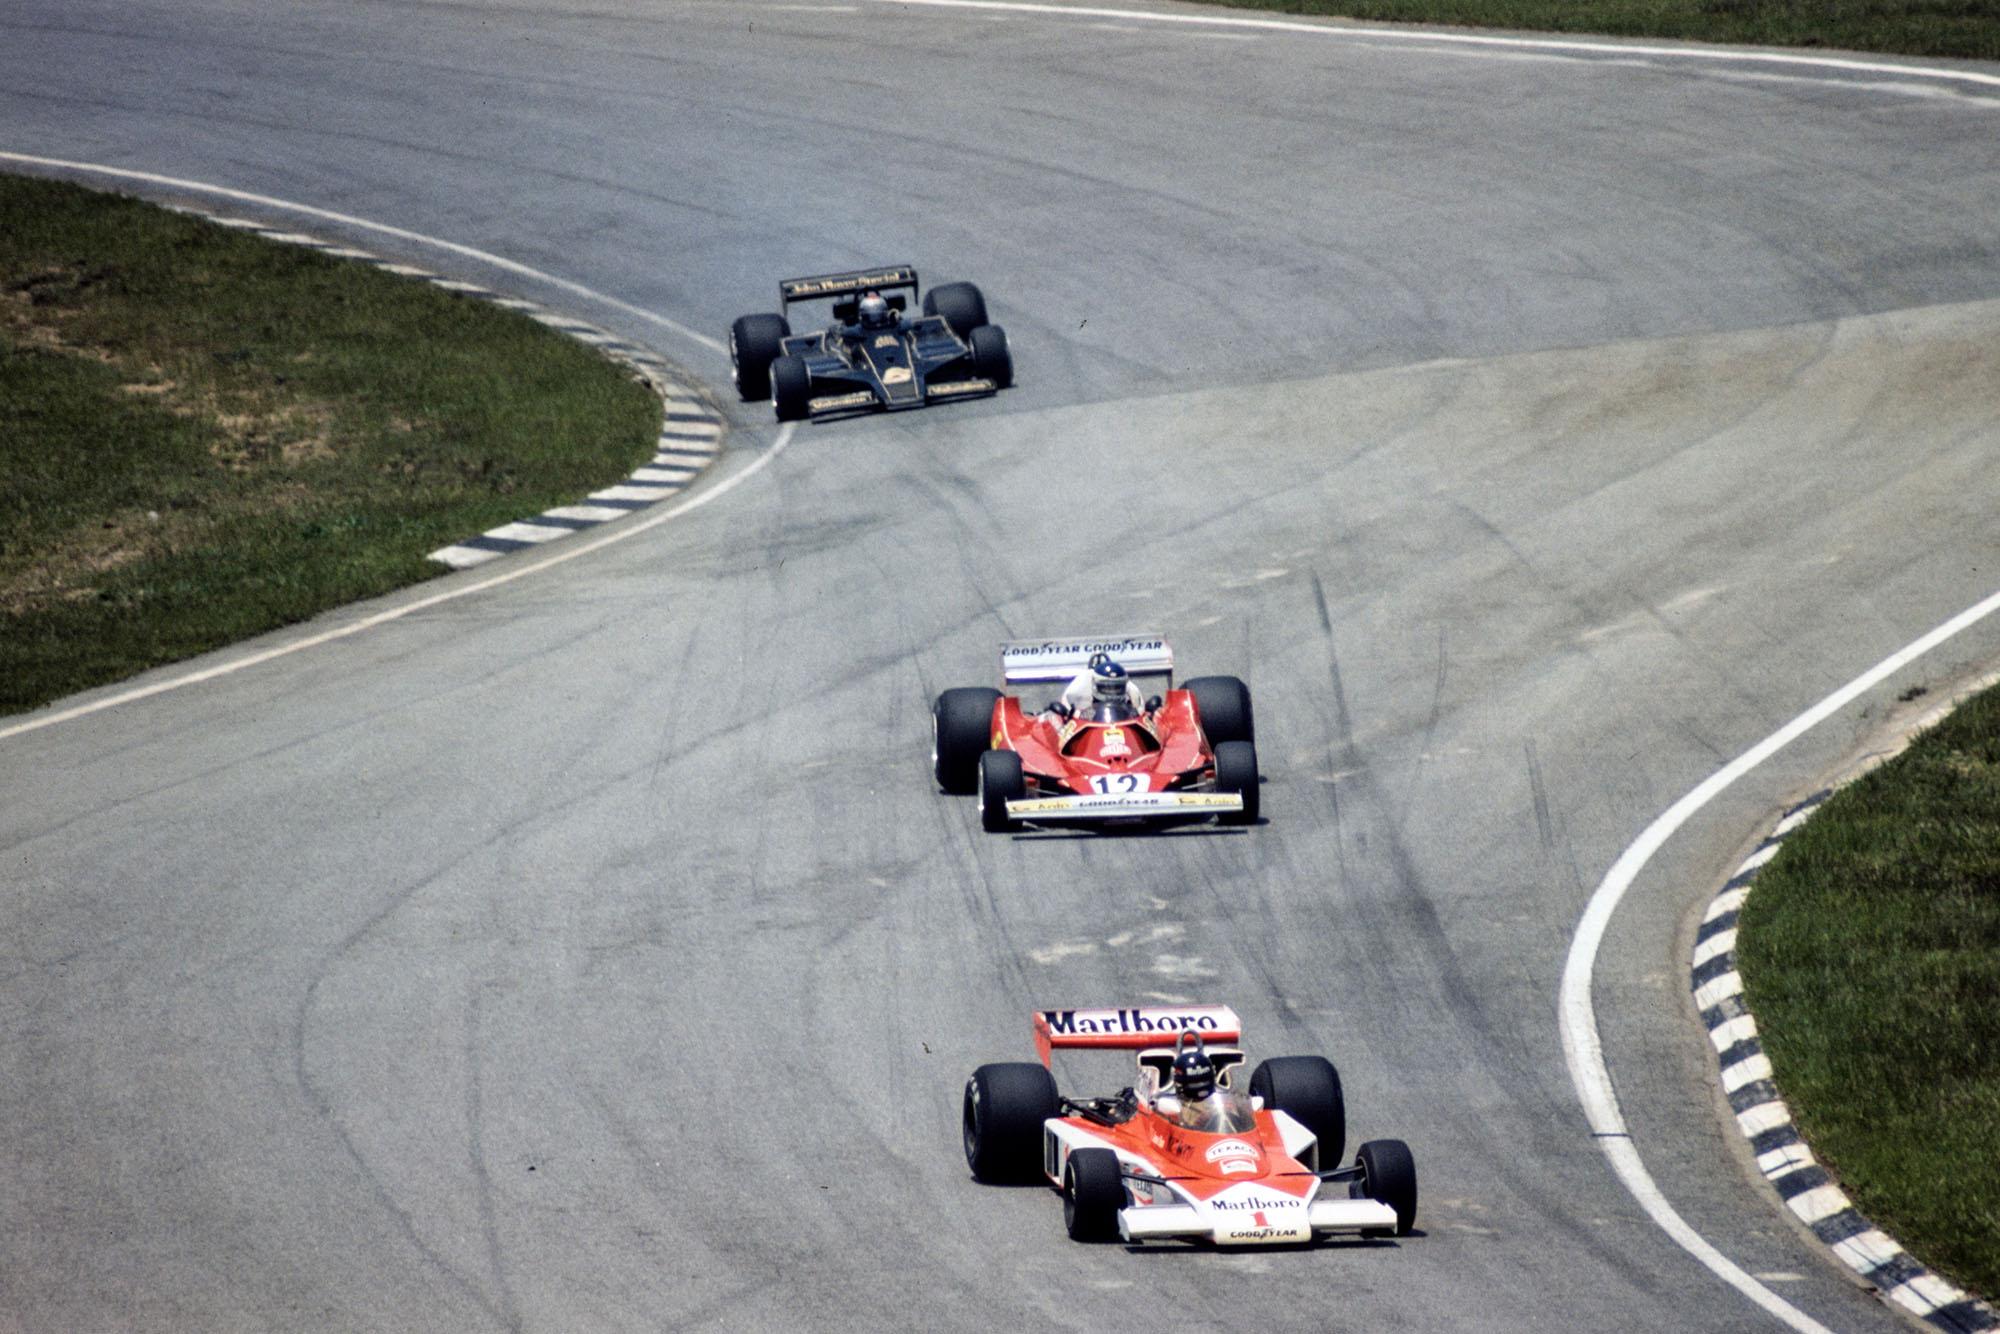 James Hunt (McLaren) leads Carlos Reutemann (Ferrari) and Mario Andretti (Lotus), 1977 Brazilian Grand Prix, Interlagos.